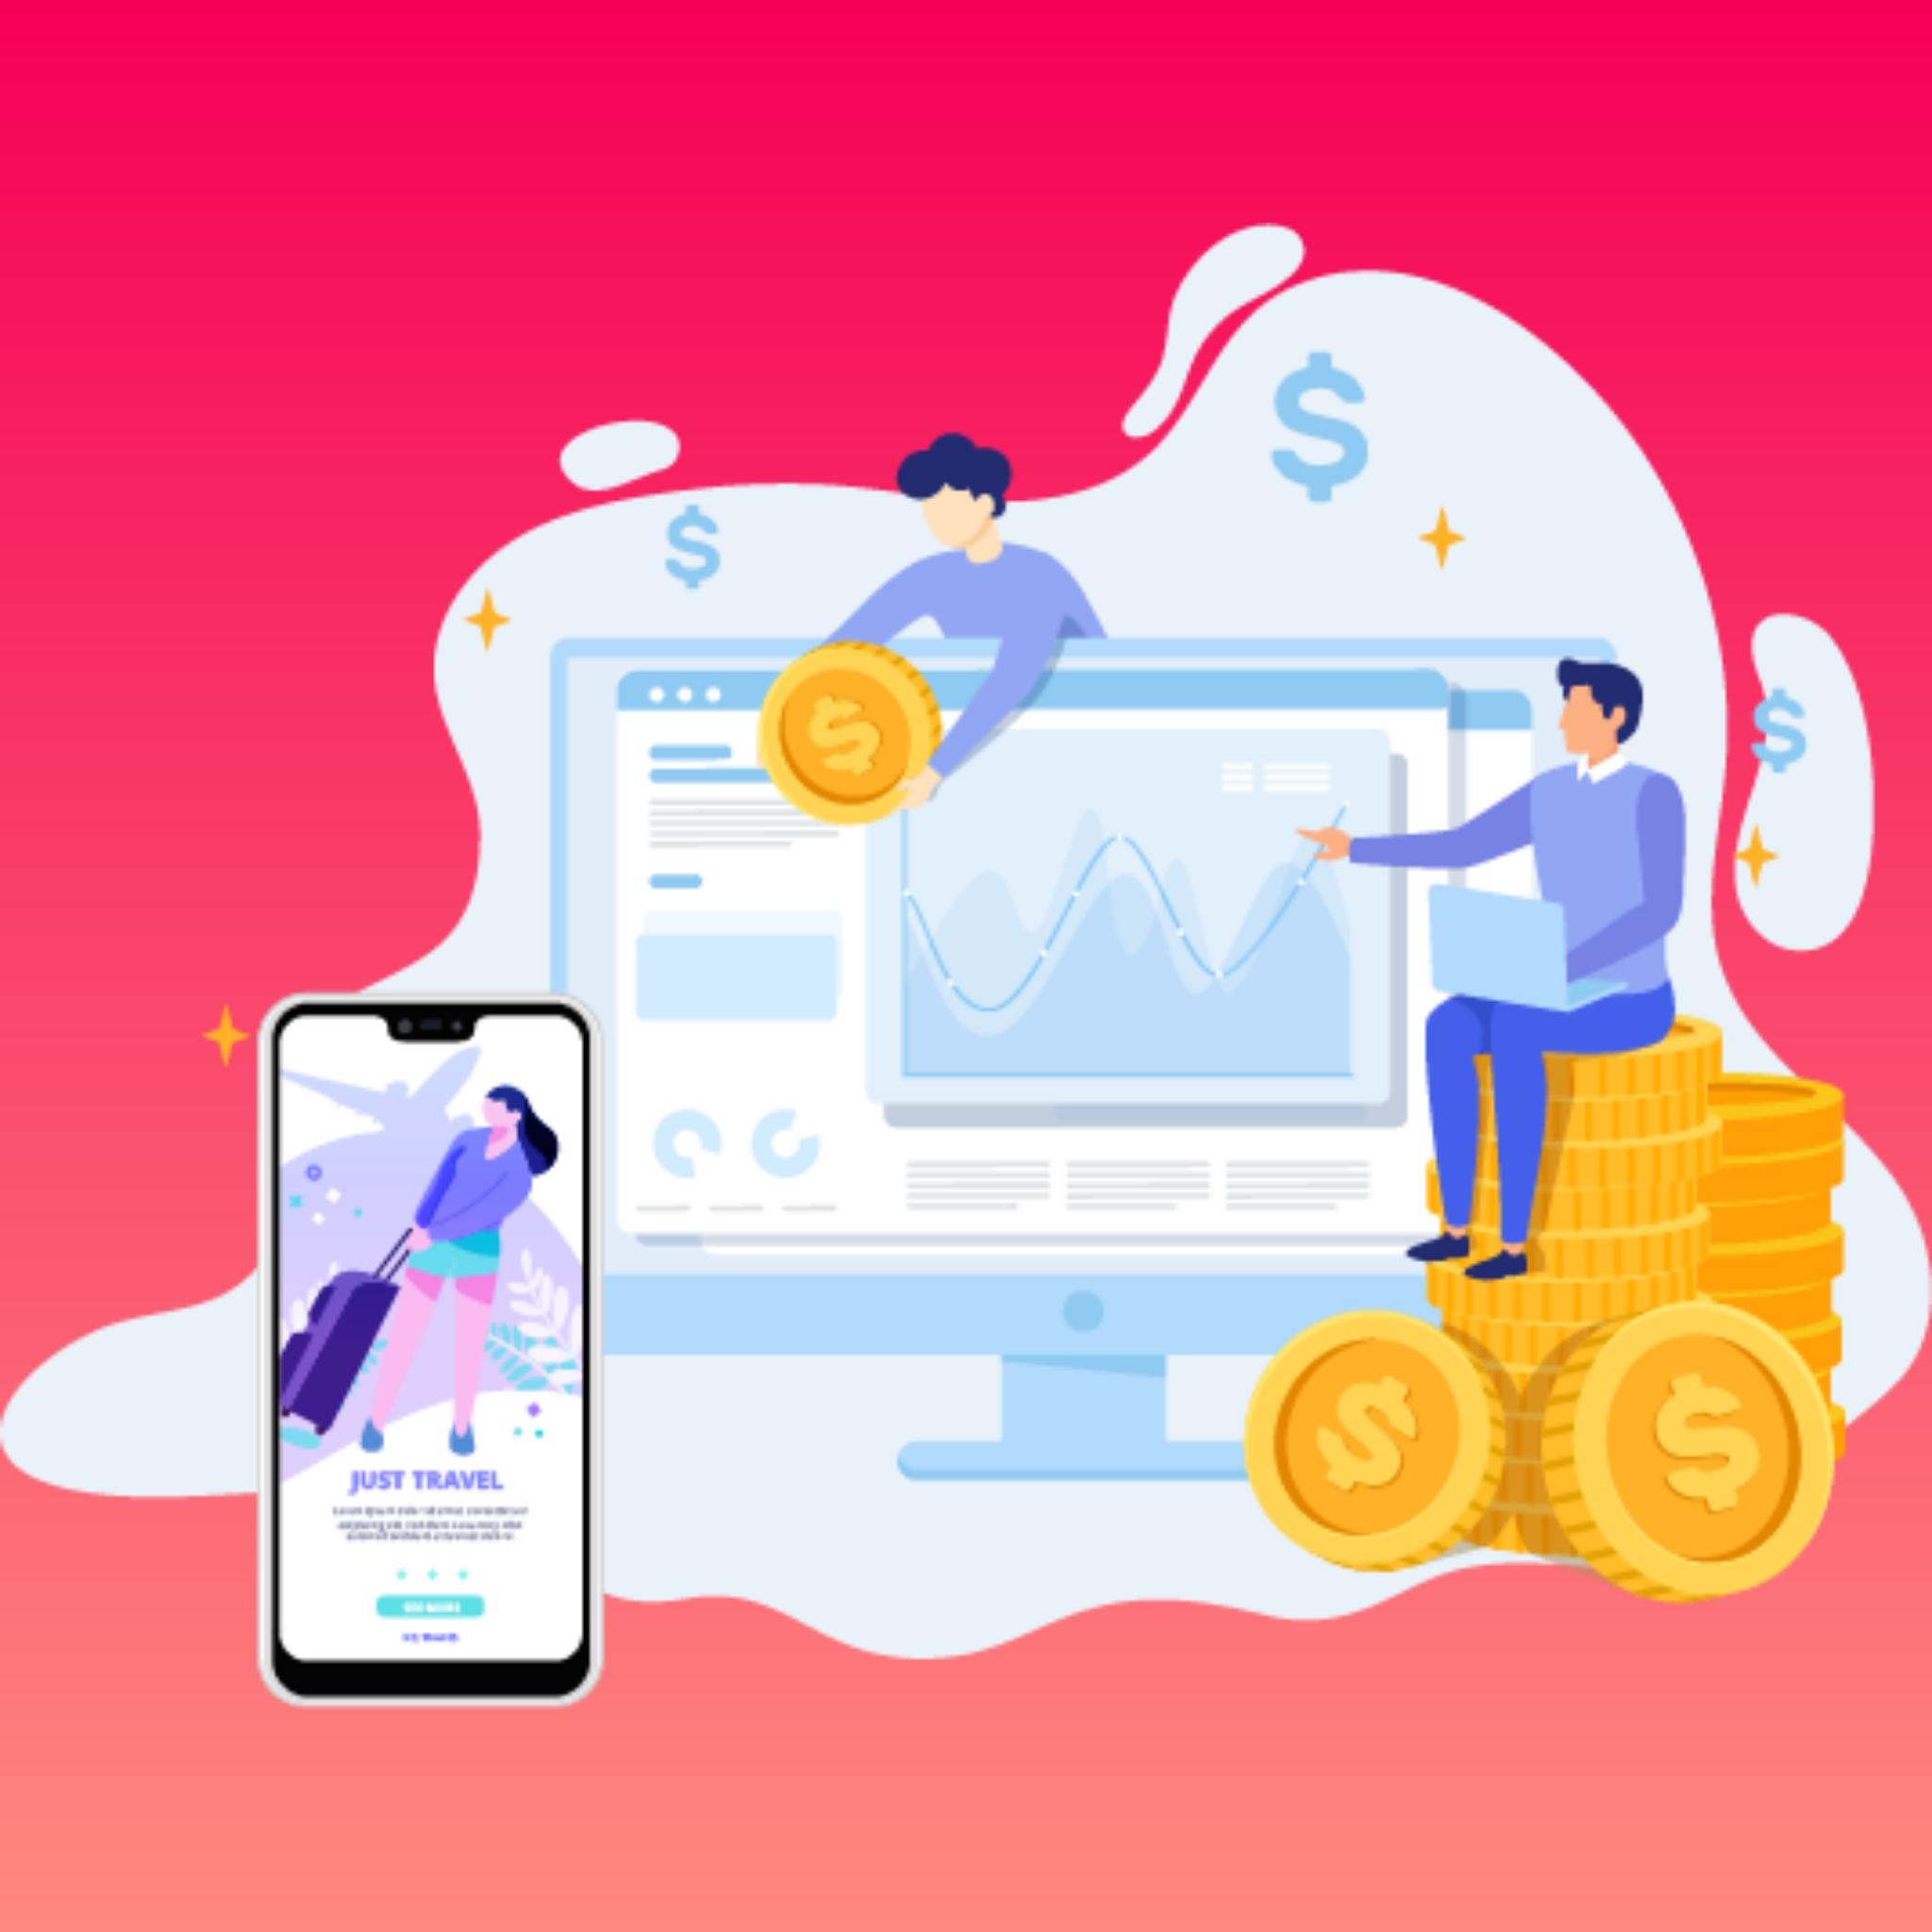 Best Travel Platform Development Like Booking.com